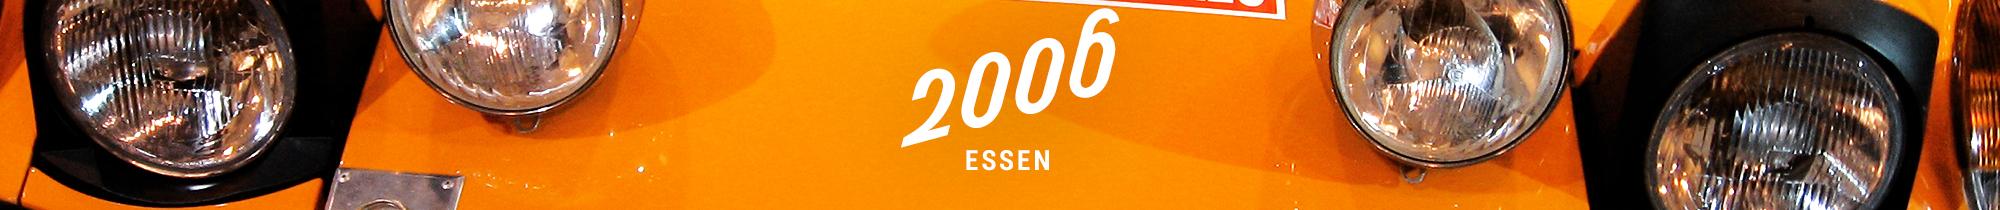 2006-essen-slidi-01